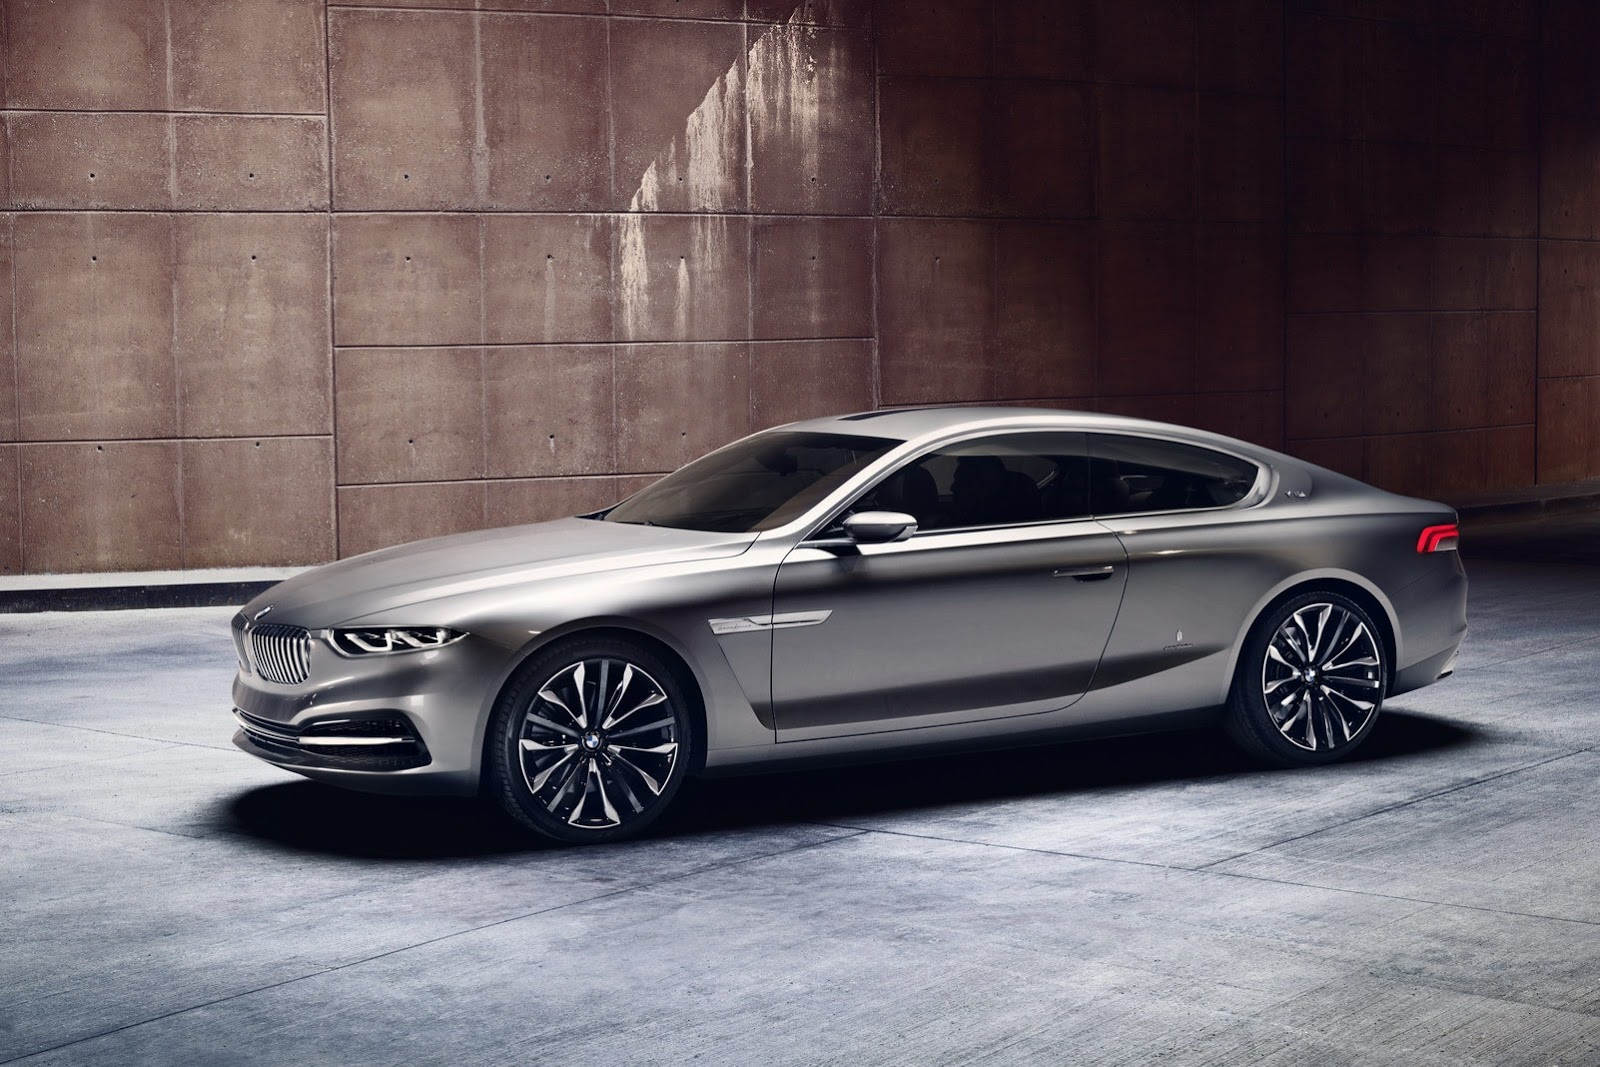 BMW Pininfarina Gran Lusso Coupé (concept, 2013)